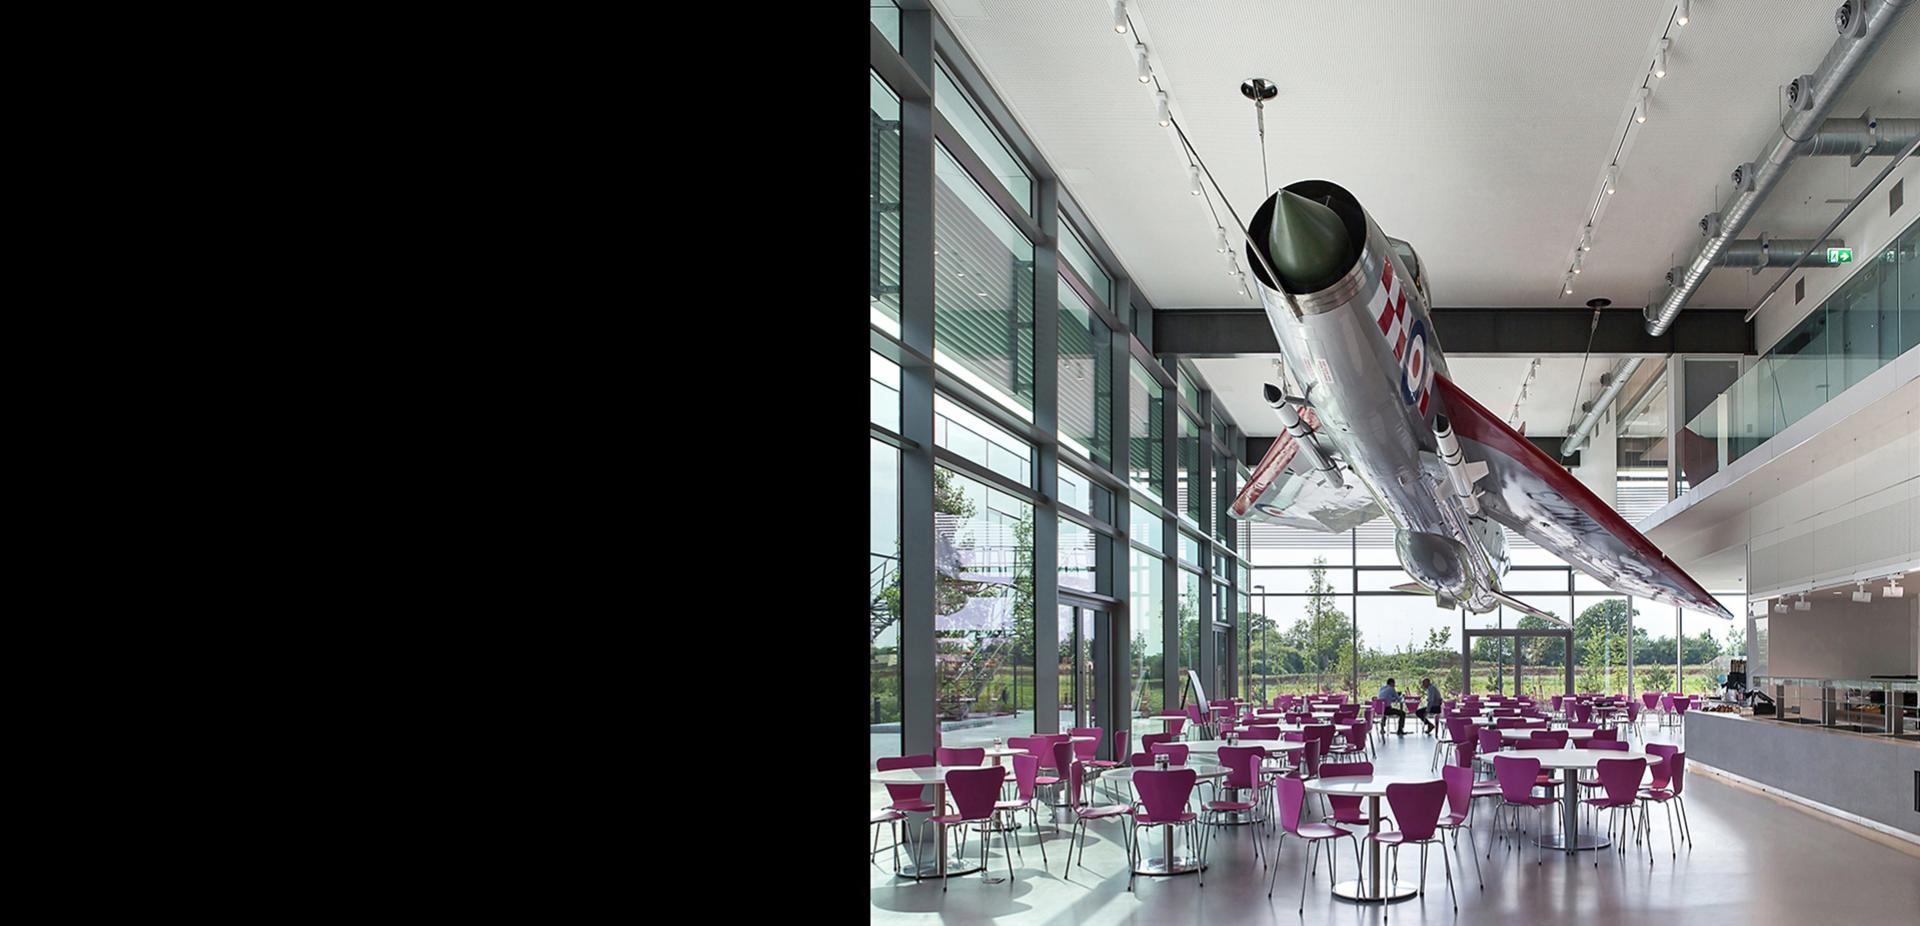 Dyson café with English Electric Lightning jet